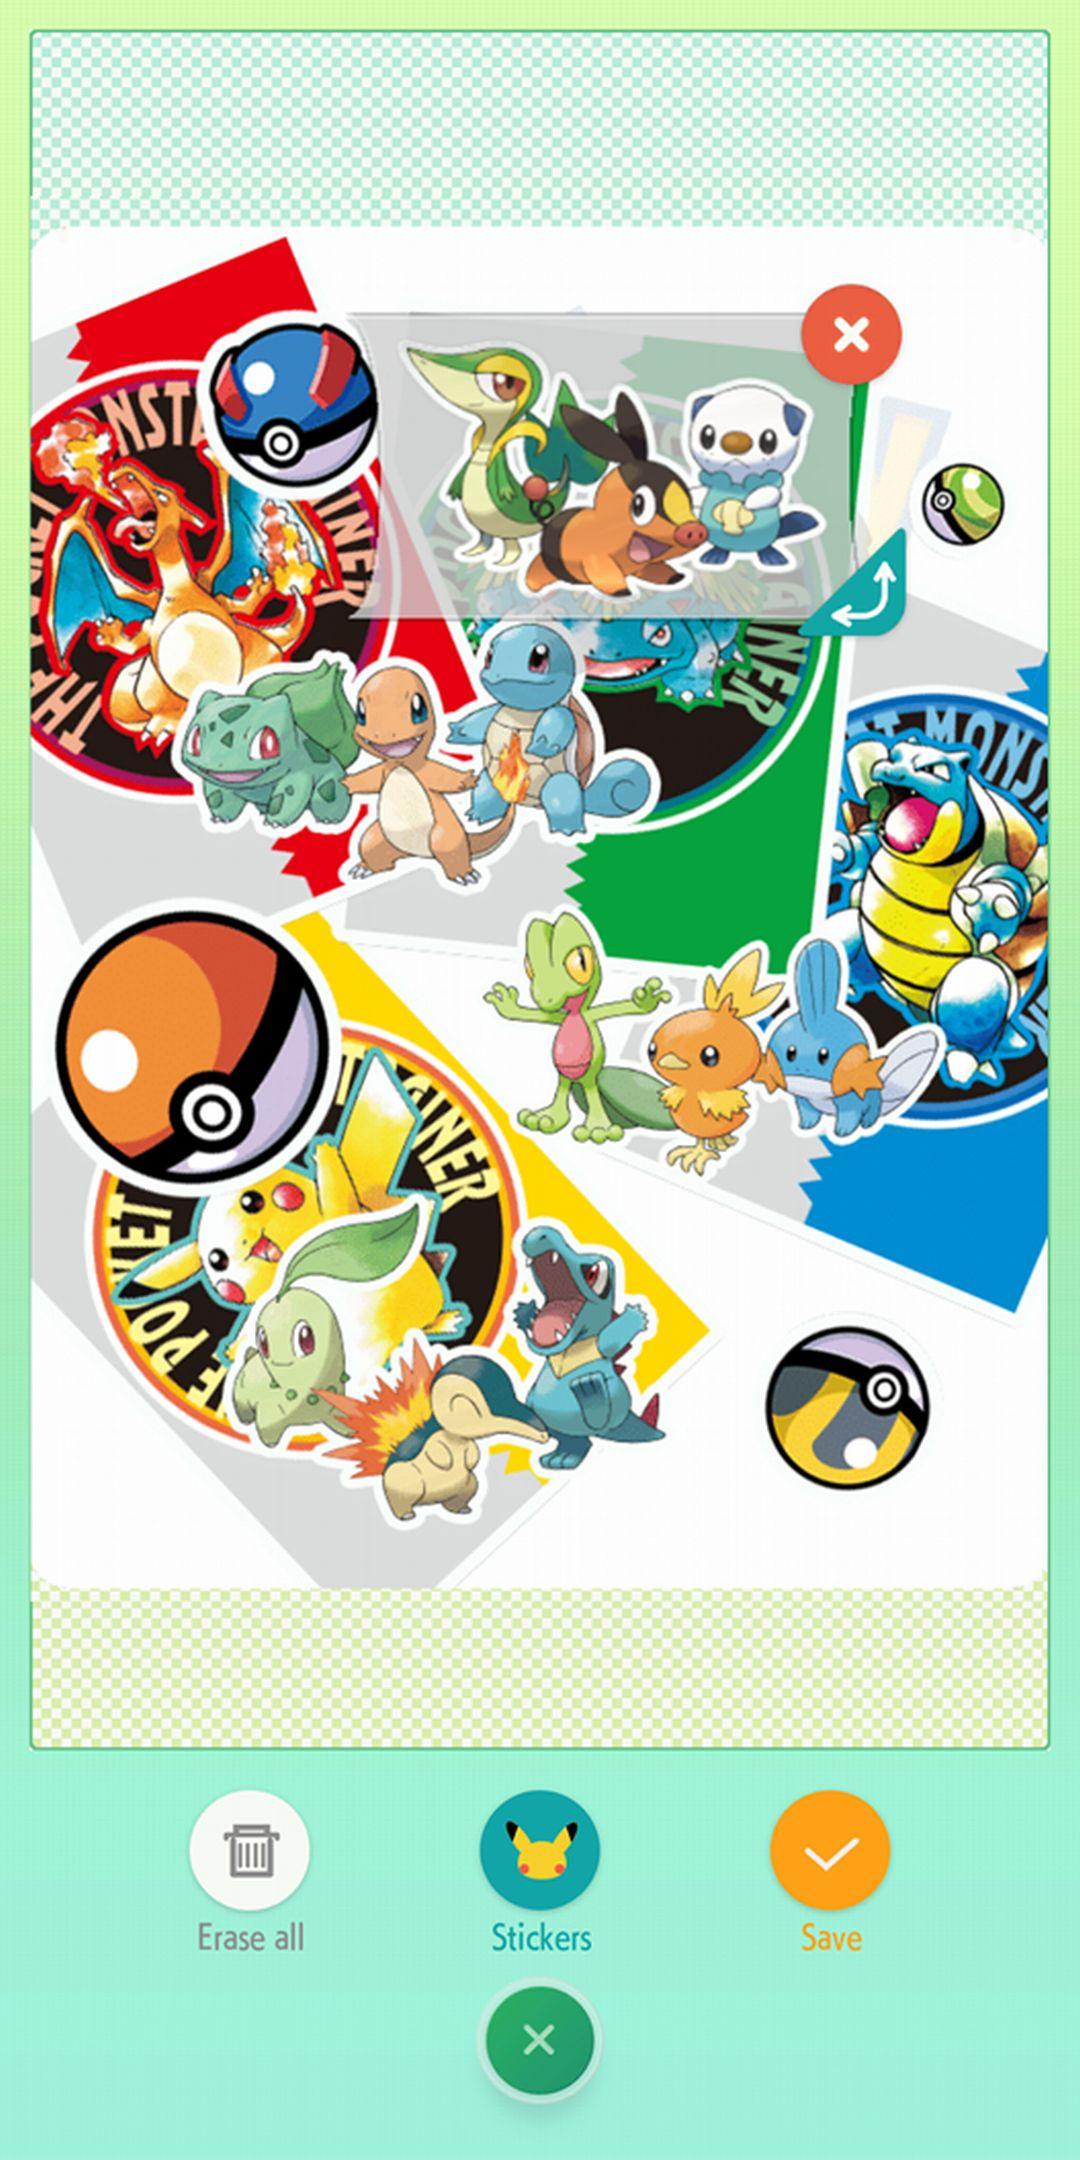 Pokemon-Home_2020_01-28-20_040